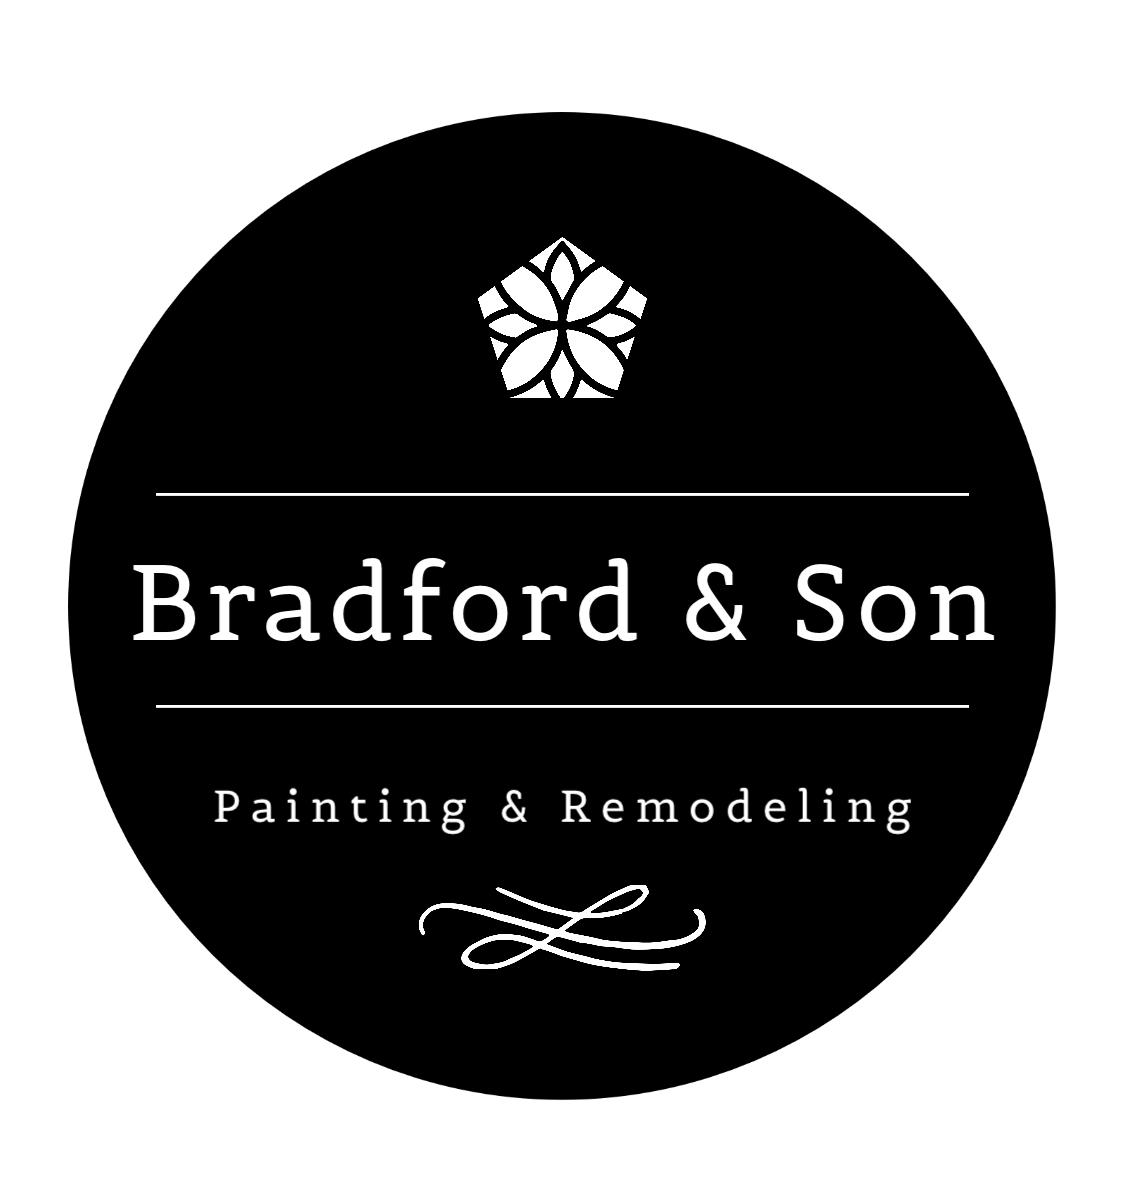 Bradford & Son Painting & Remodeling  logo